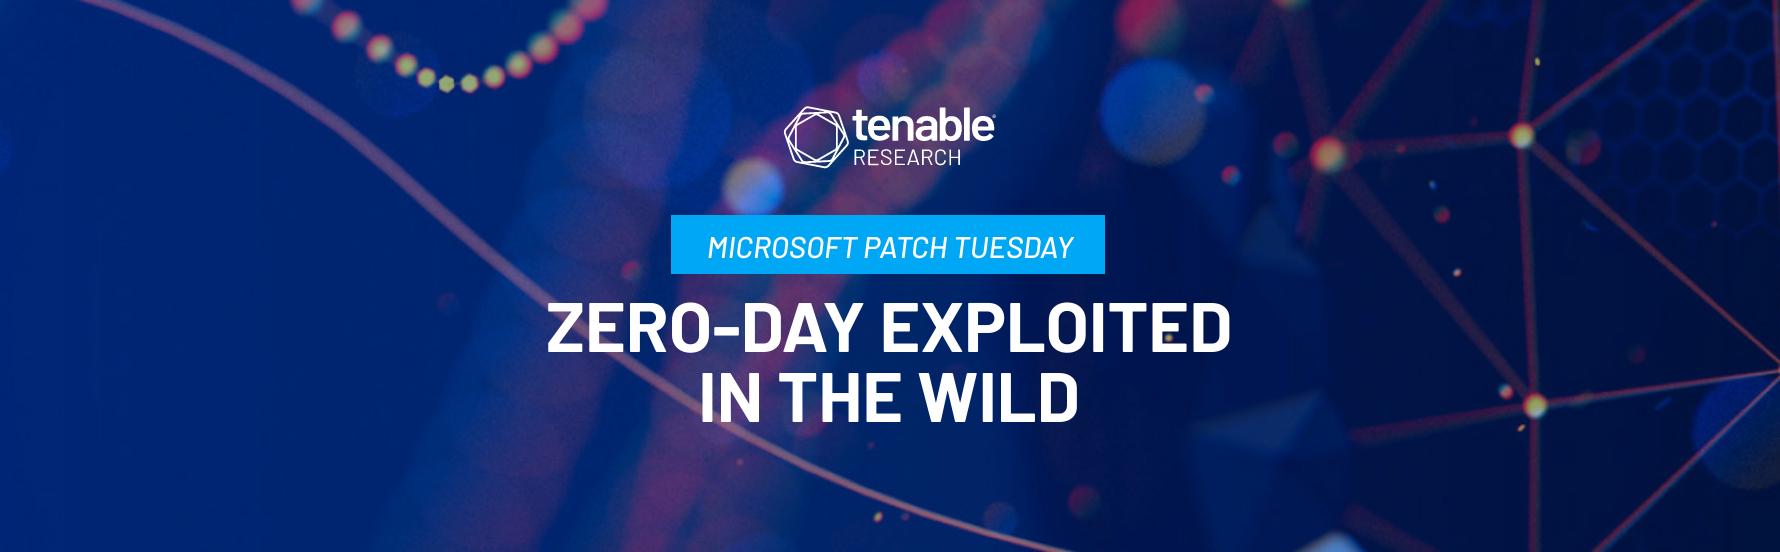 Microsoft's October 2021 Patch Tuesday Addresses 74 CVEs (CVE-2021-40449)